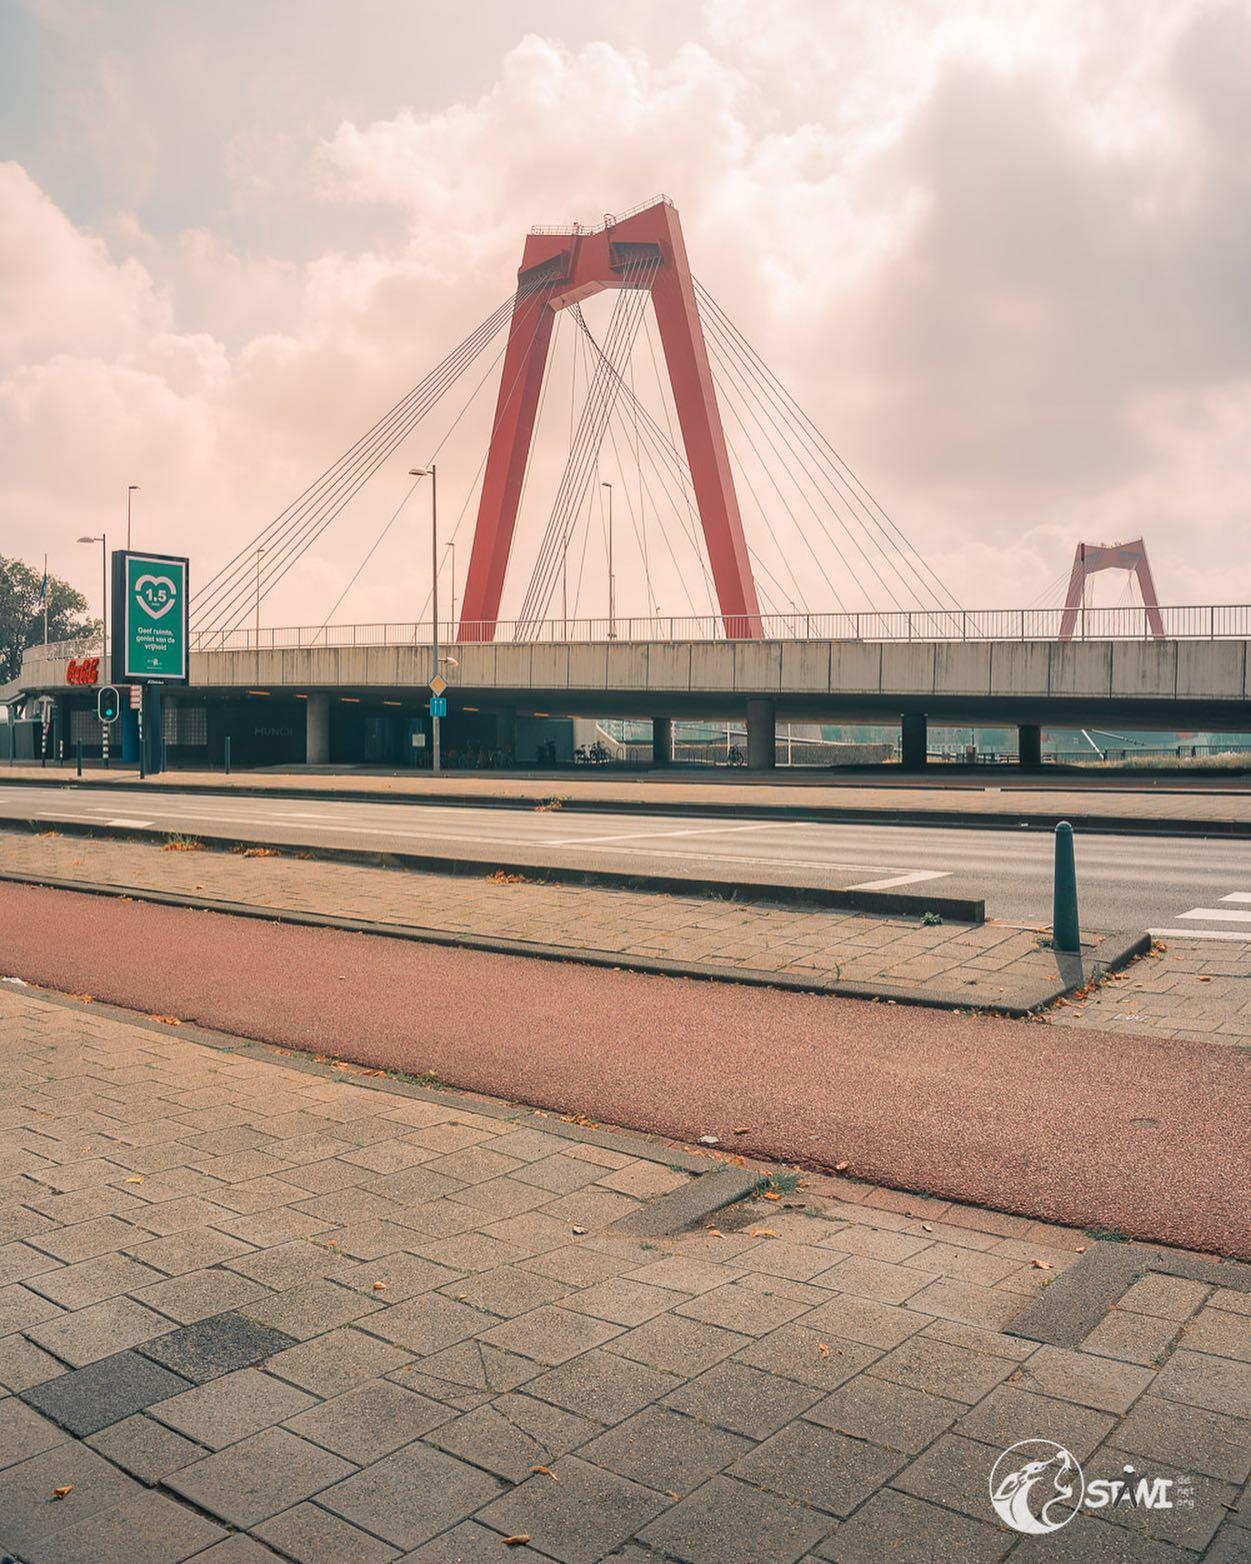 A little stroll in Rotterdam